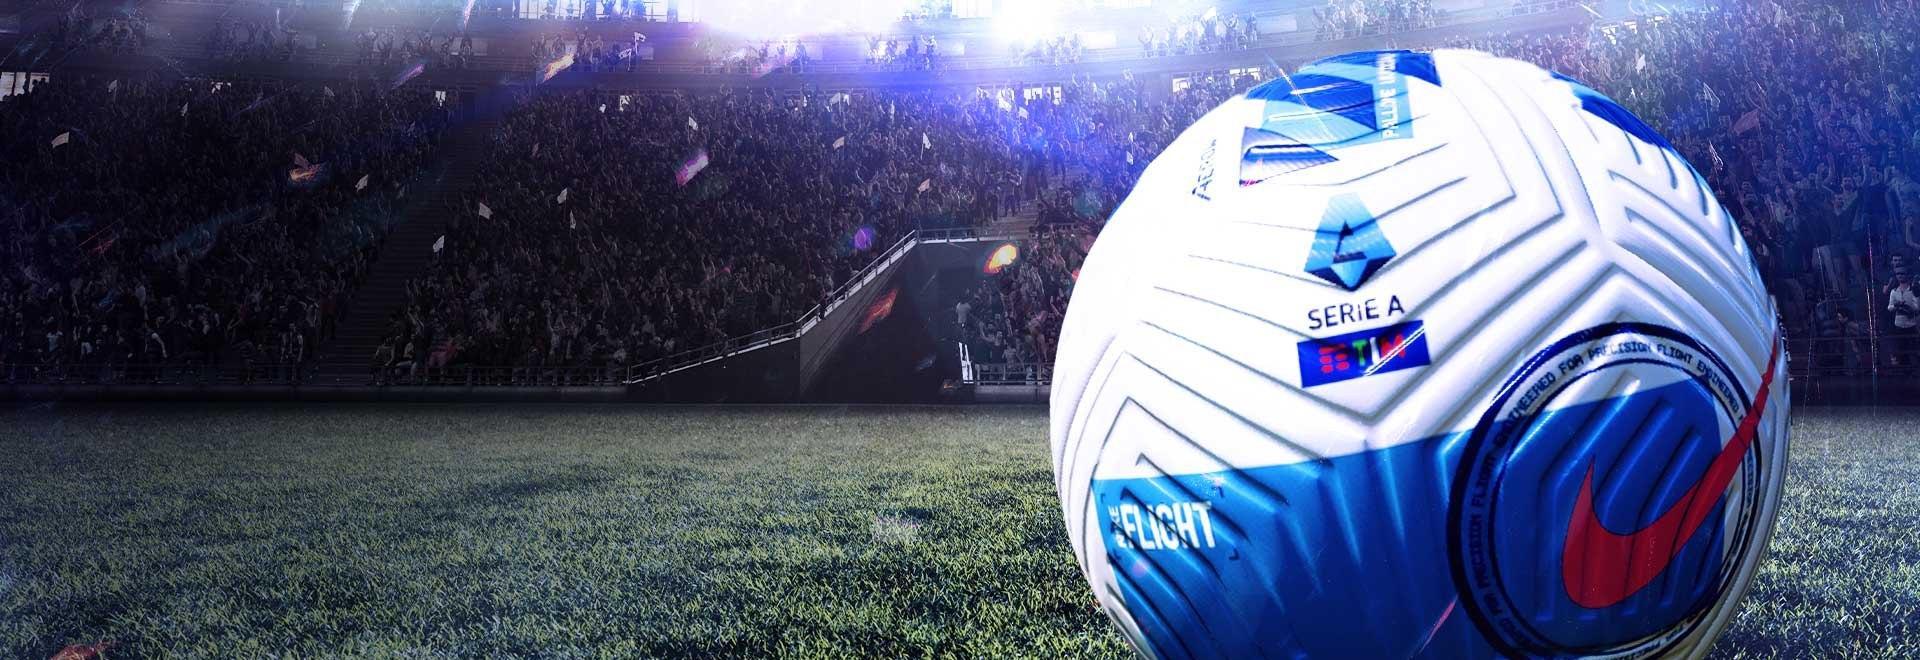 Verona - Inter